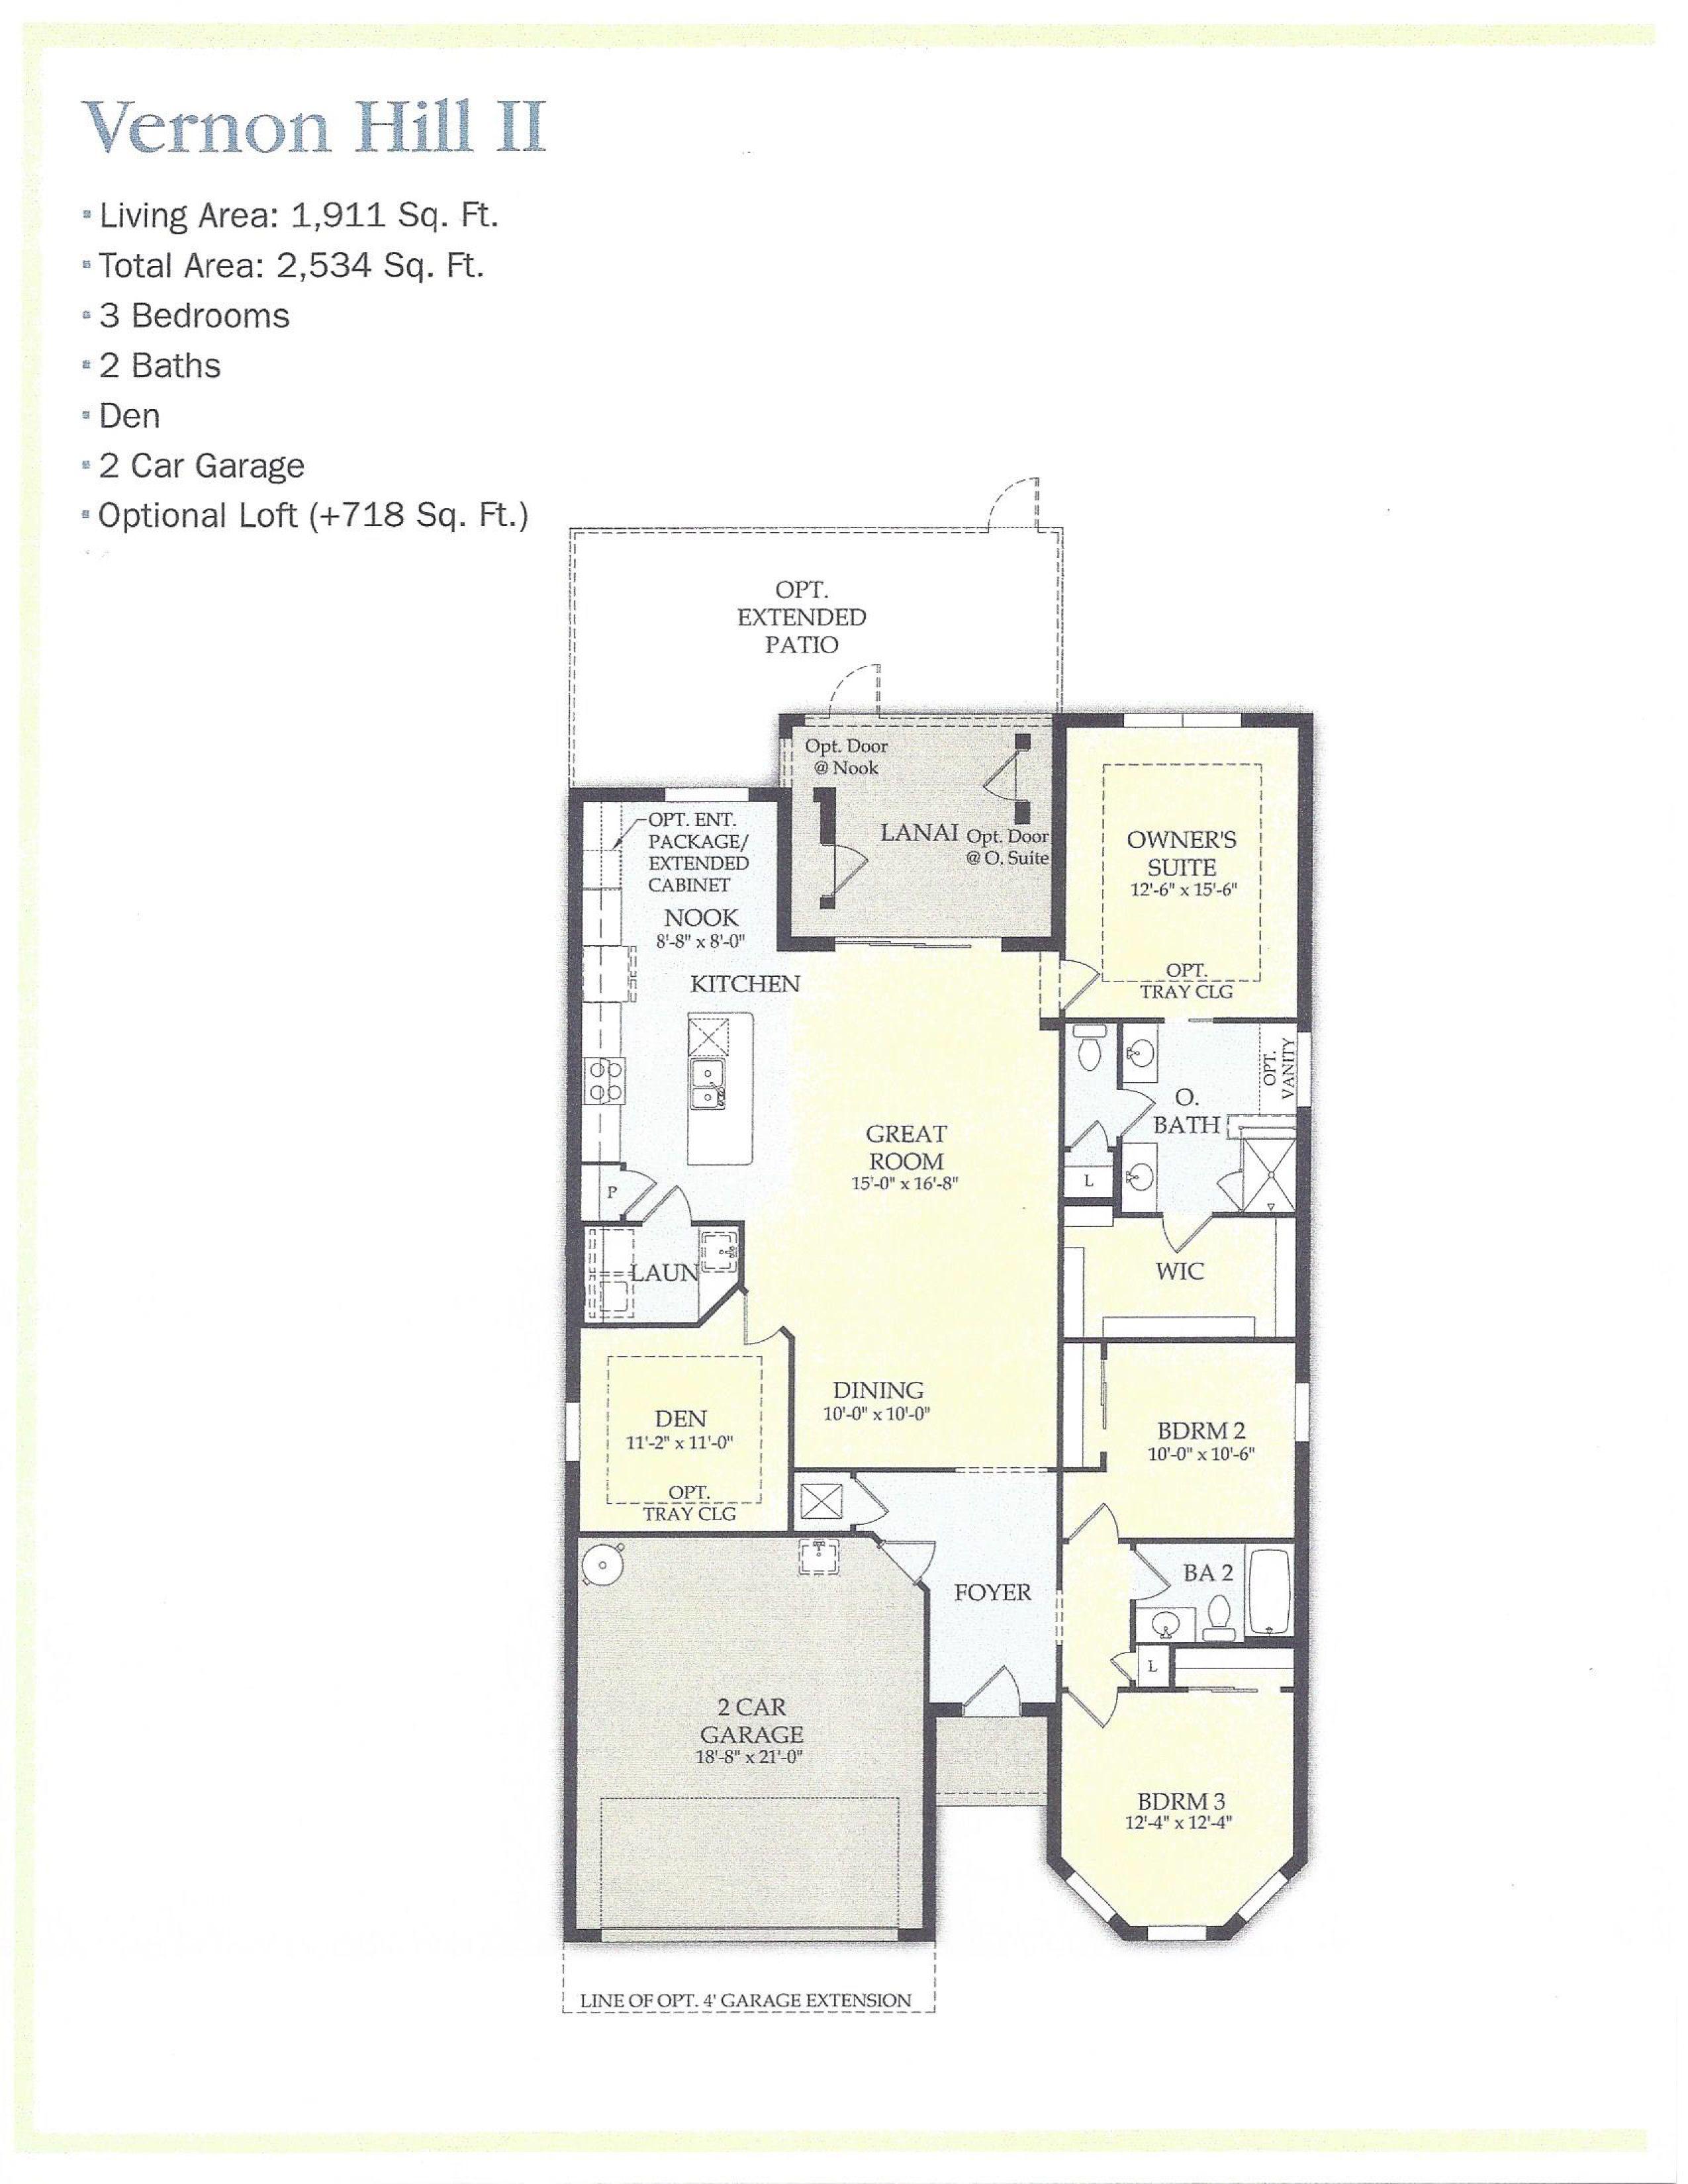 Vernon Hill Ii Floor Plan Camden Lakes Naples Fl Naples Real Estate Floor Plans Pulte Homes